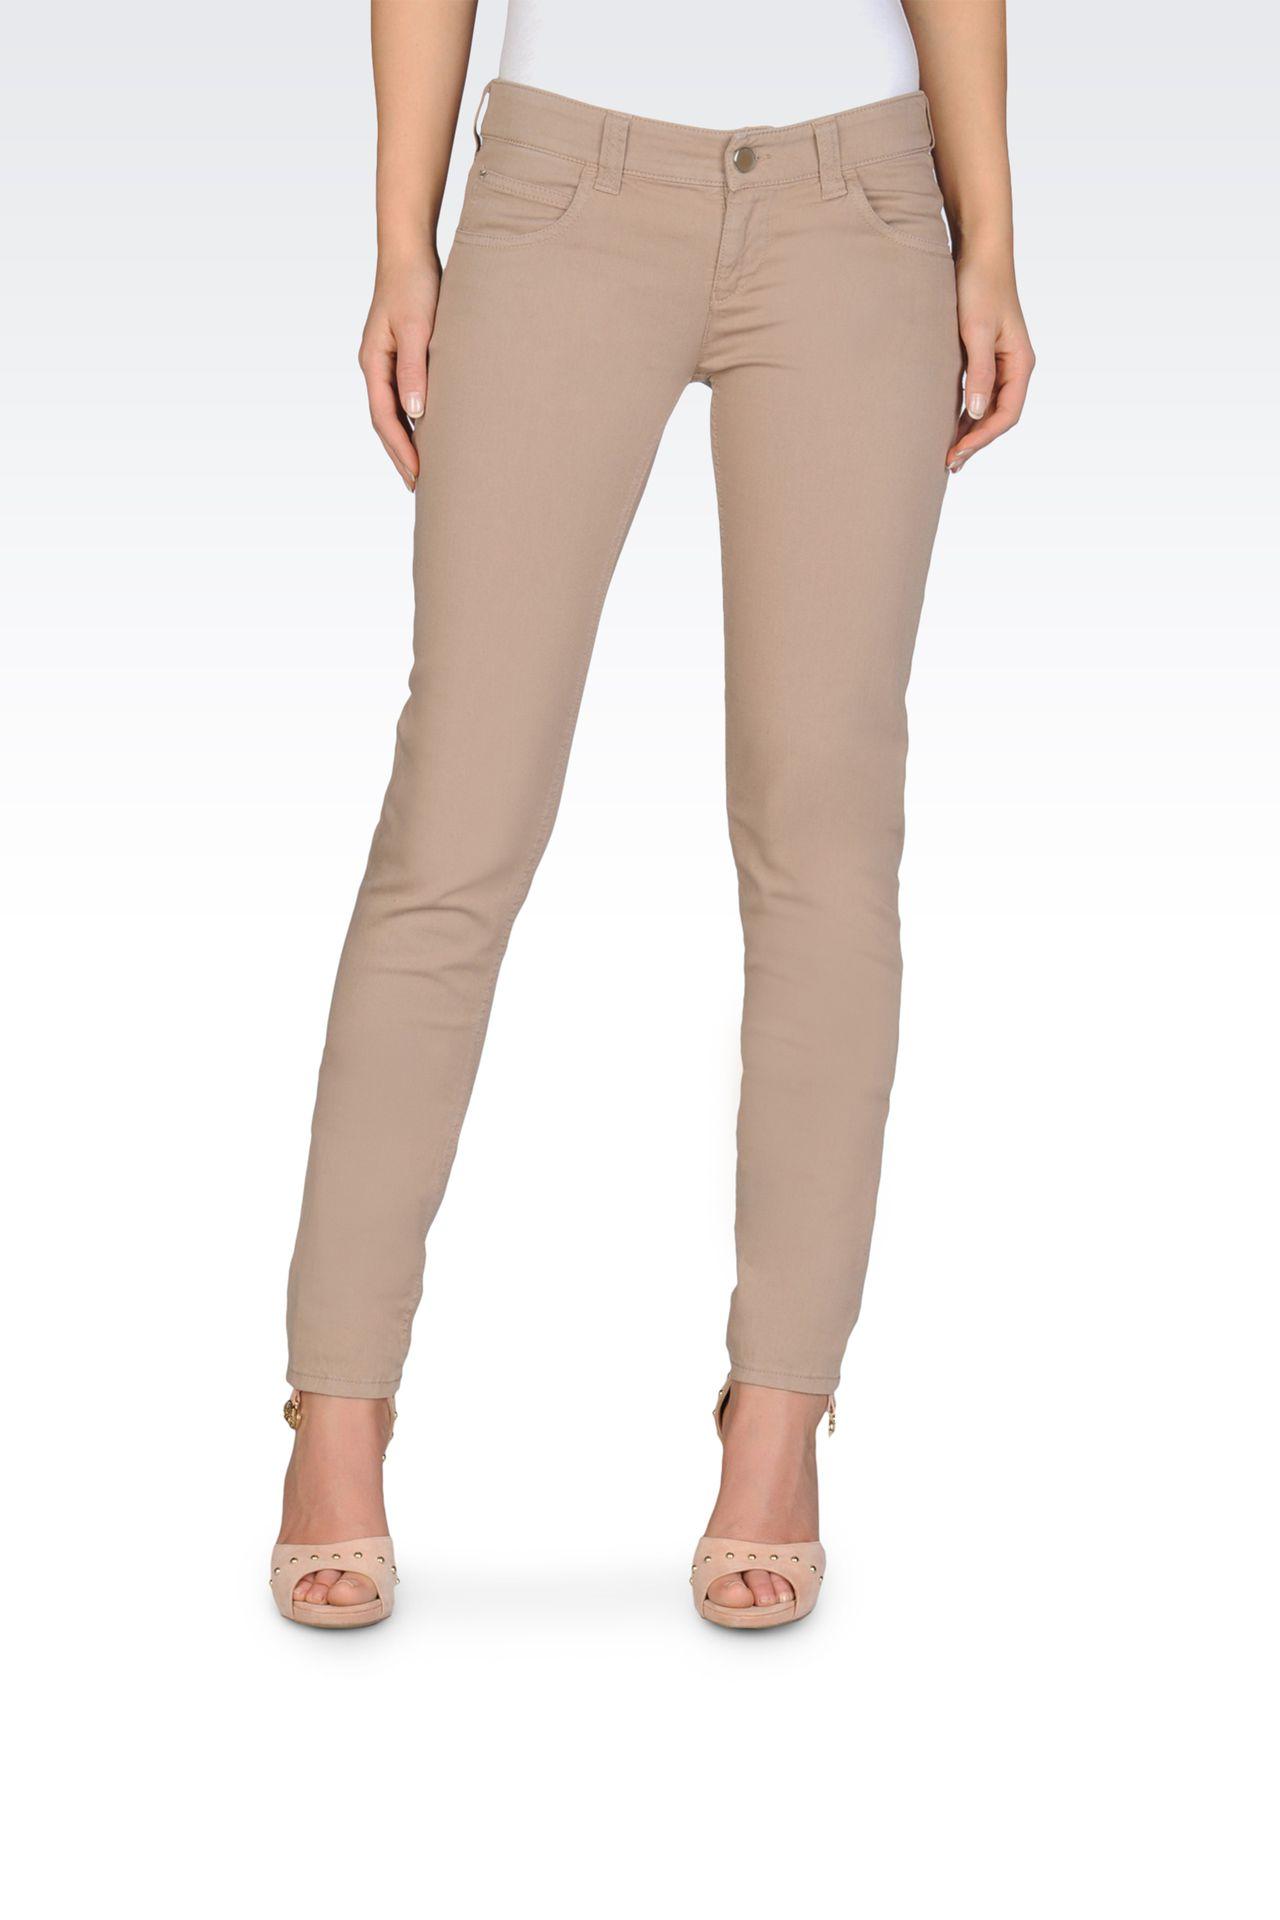 Stretch bull denim skinny jeans, old wash: 5 pockets Women by Armani - 0